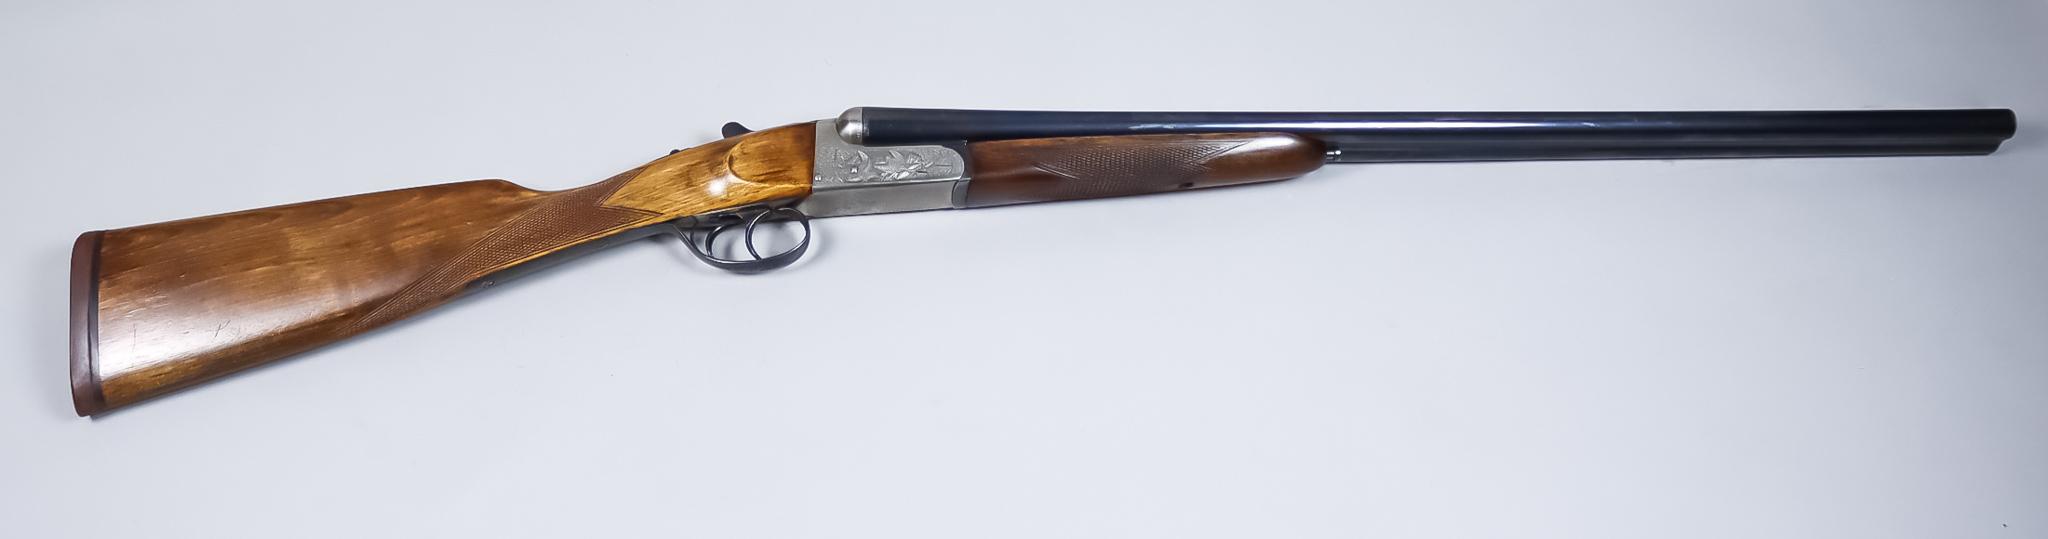 A 12 Bore Side by Side Shotgun, by Eibar of Spain, 28ins blued steel barrels, cased hardened side